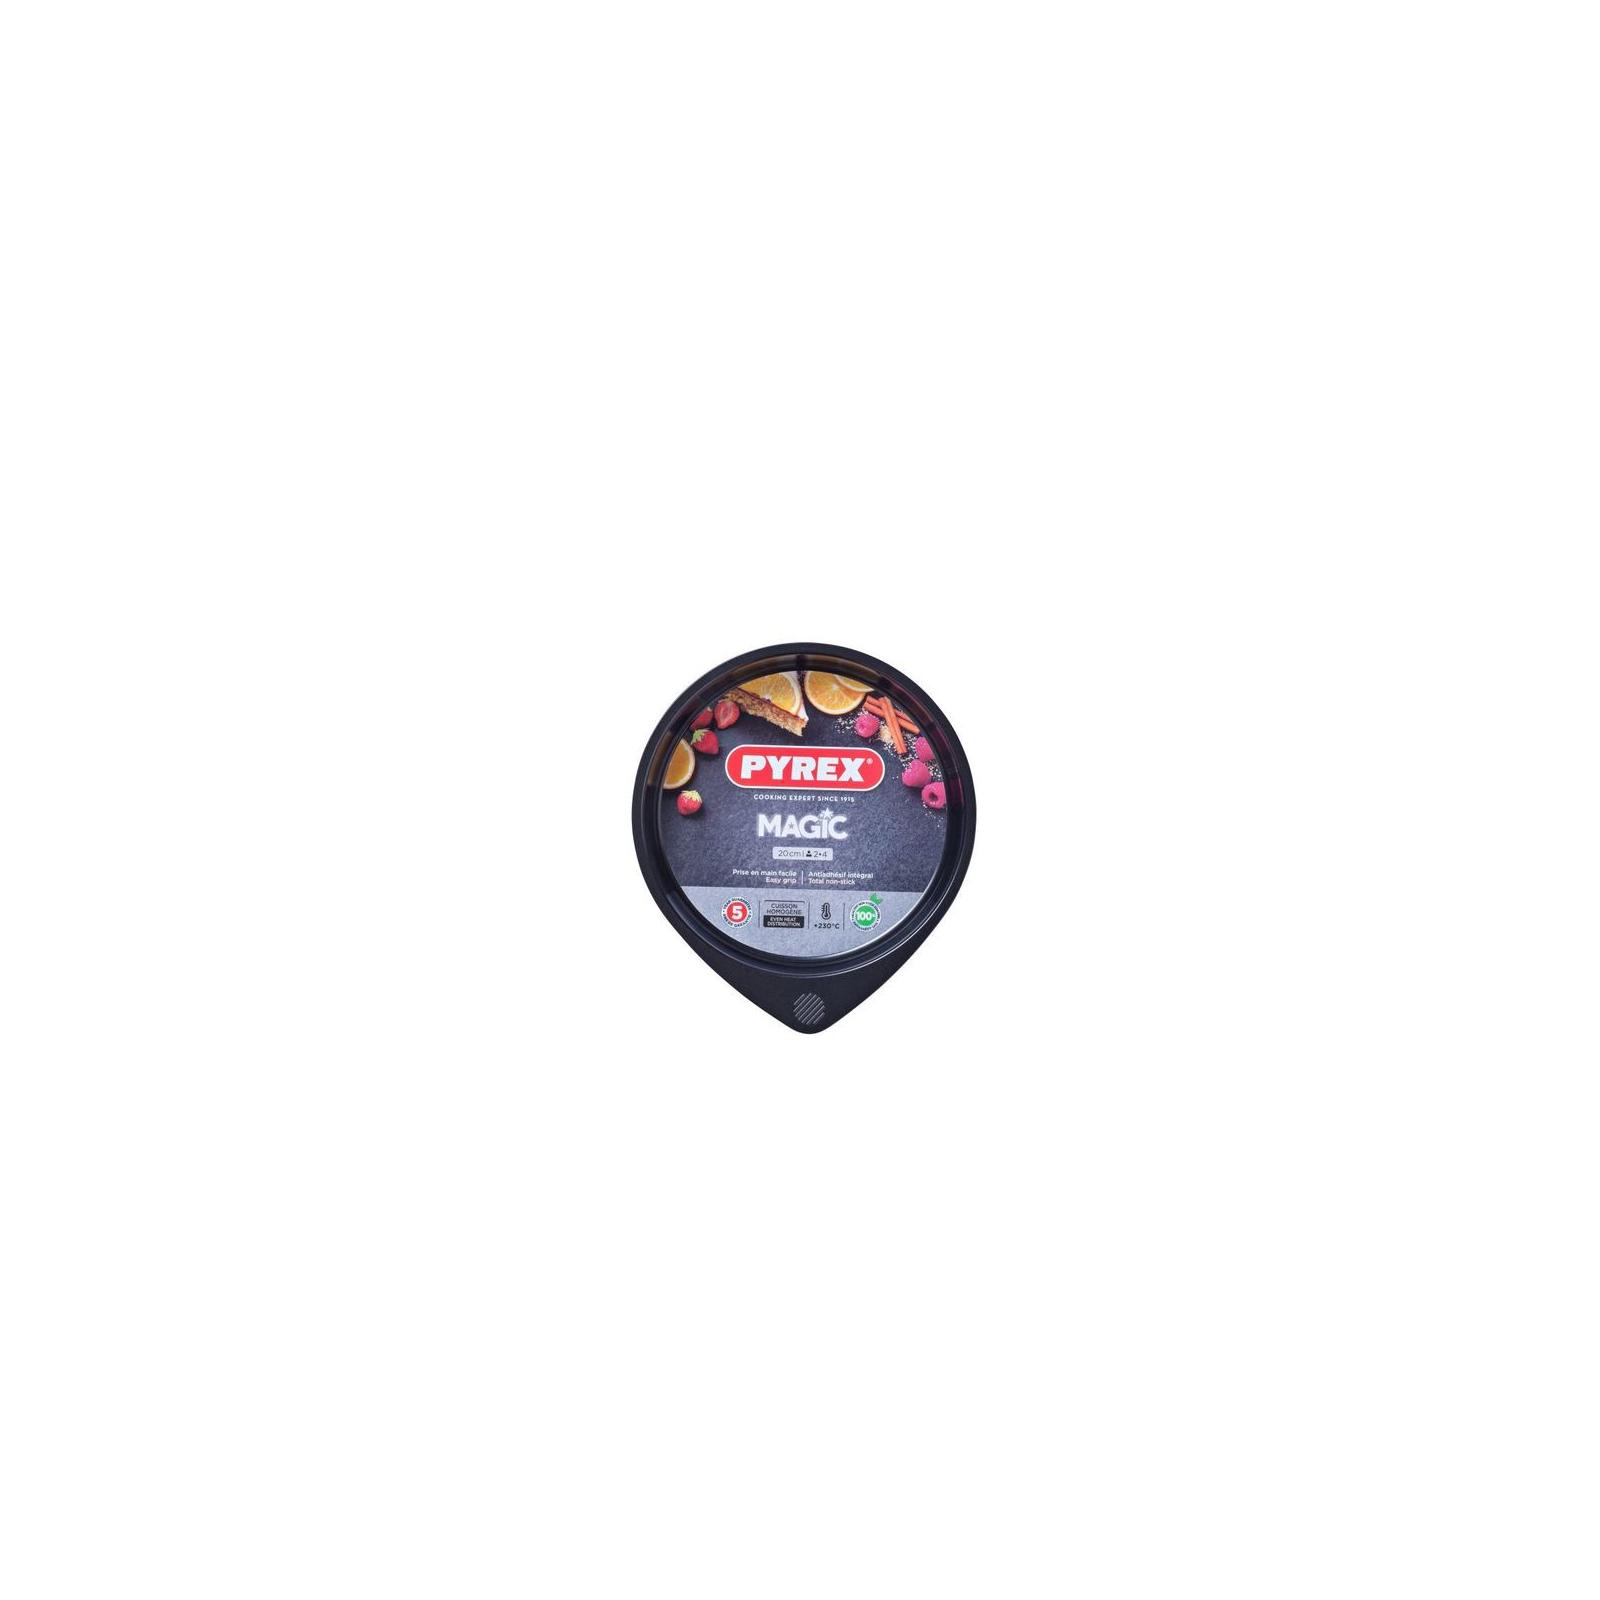 Форма для выпечки Pyrex Magic 20 см круглая (MG20BA6)